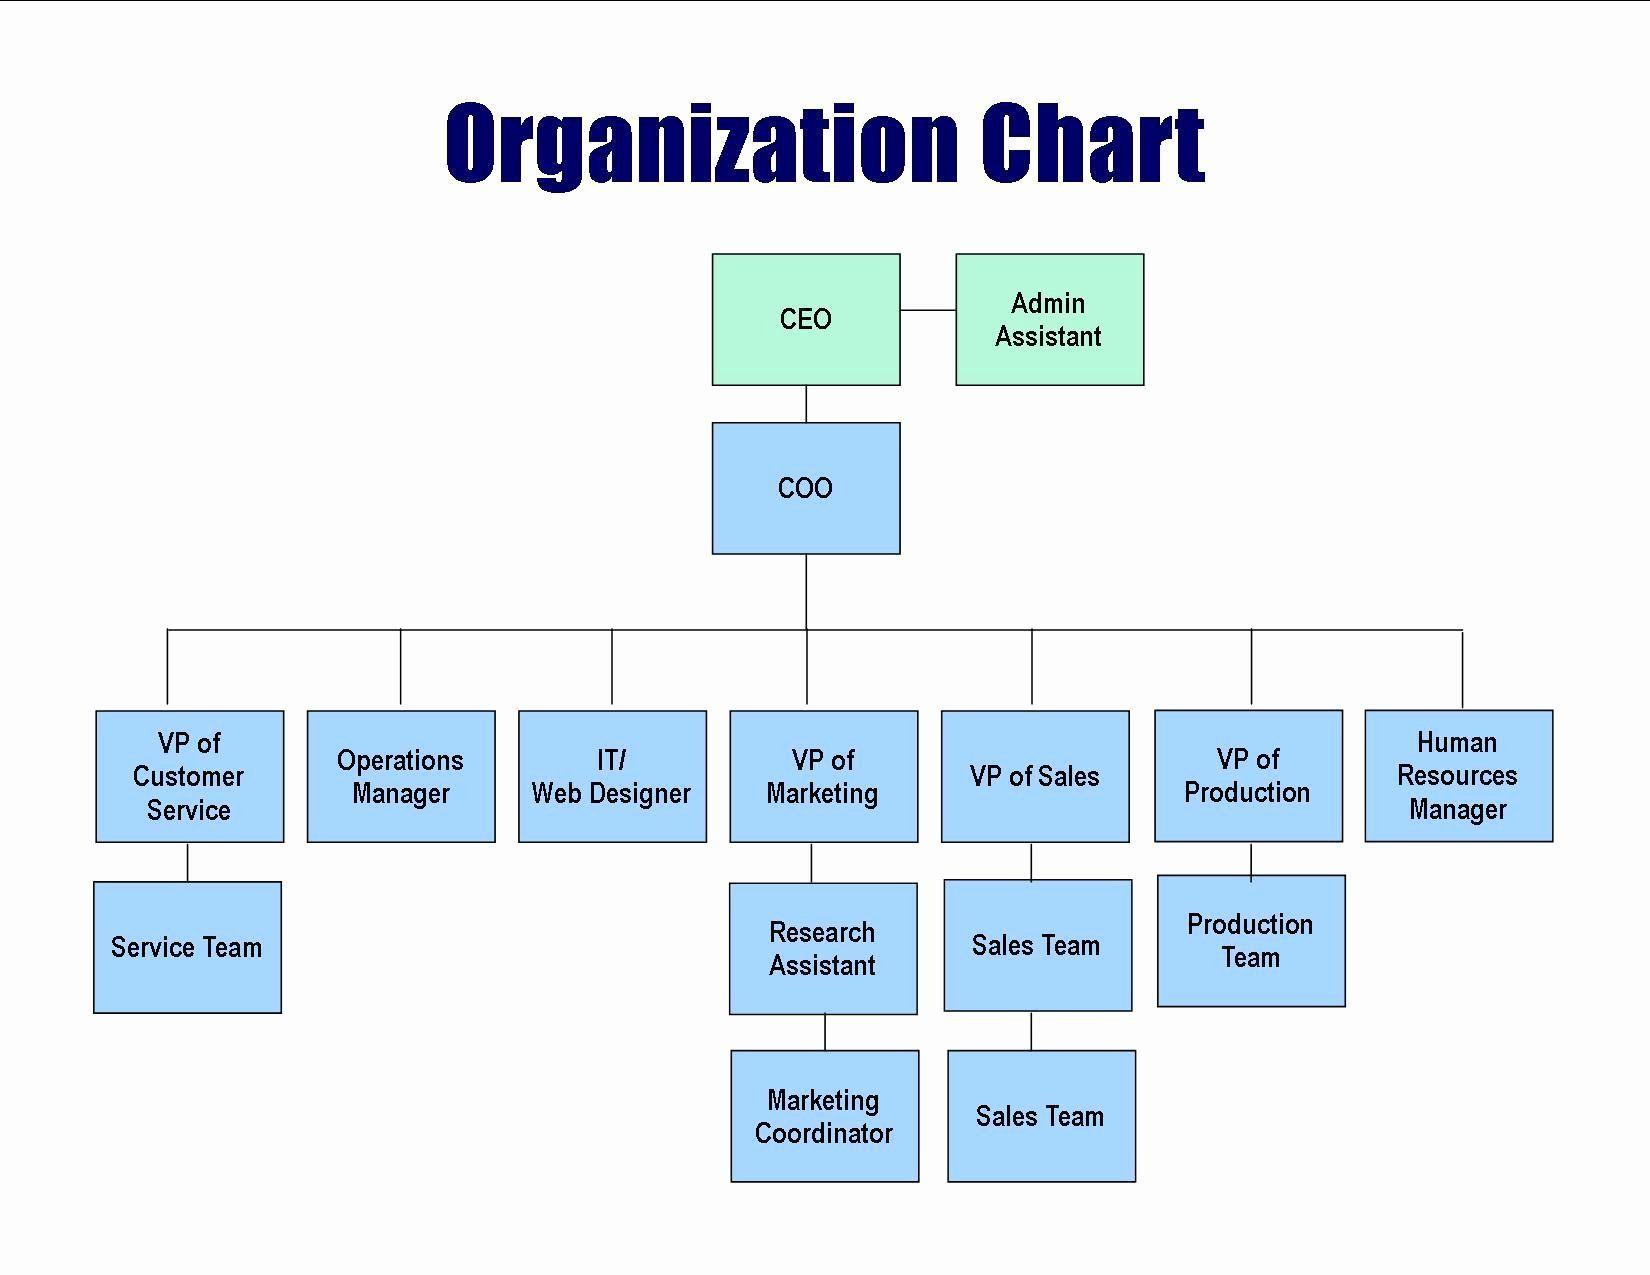 Hospital Organizational Chart Examples Fresh Hospital Organizational Chart Template S Organizational Chart Business Organizational Structure Business Org Chart